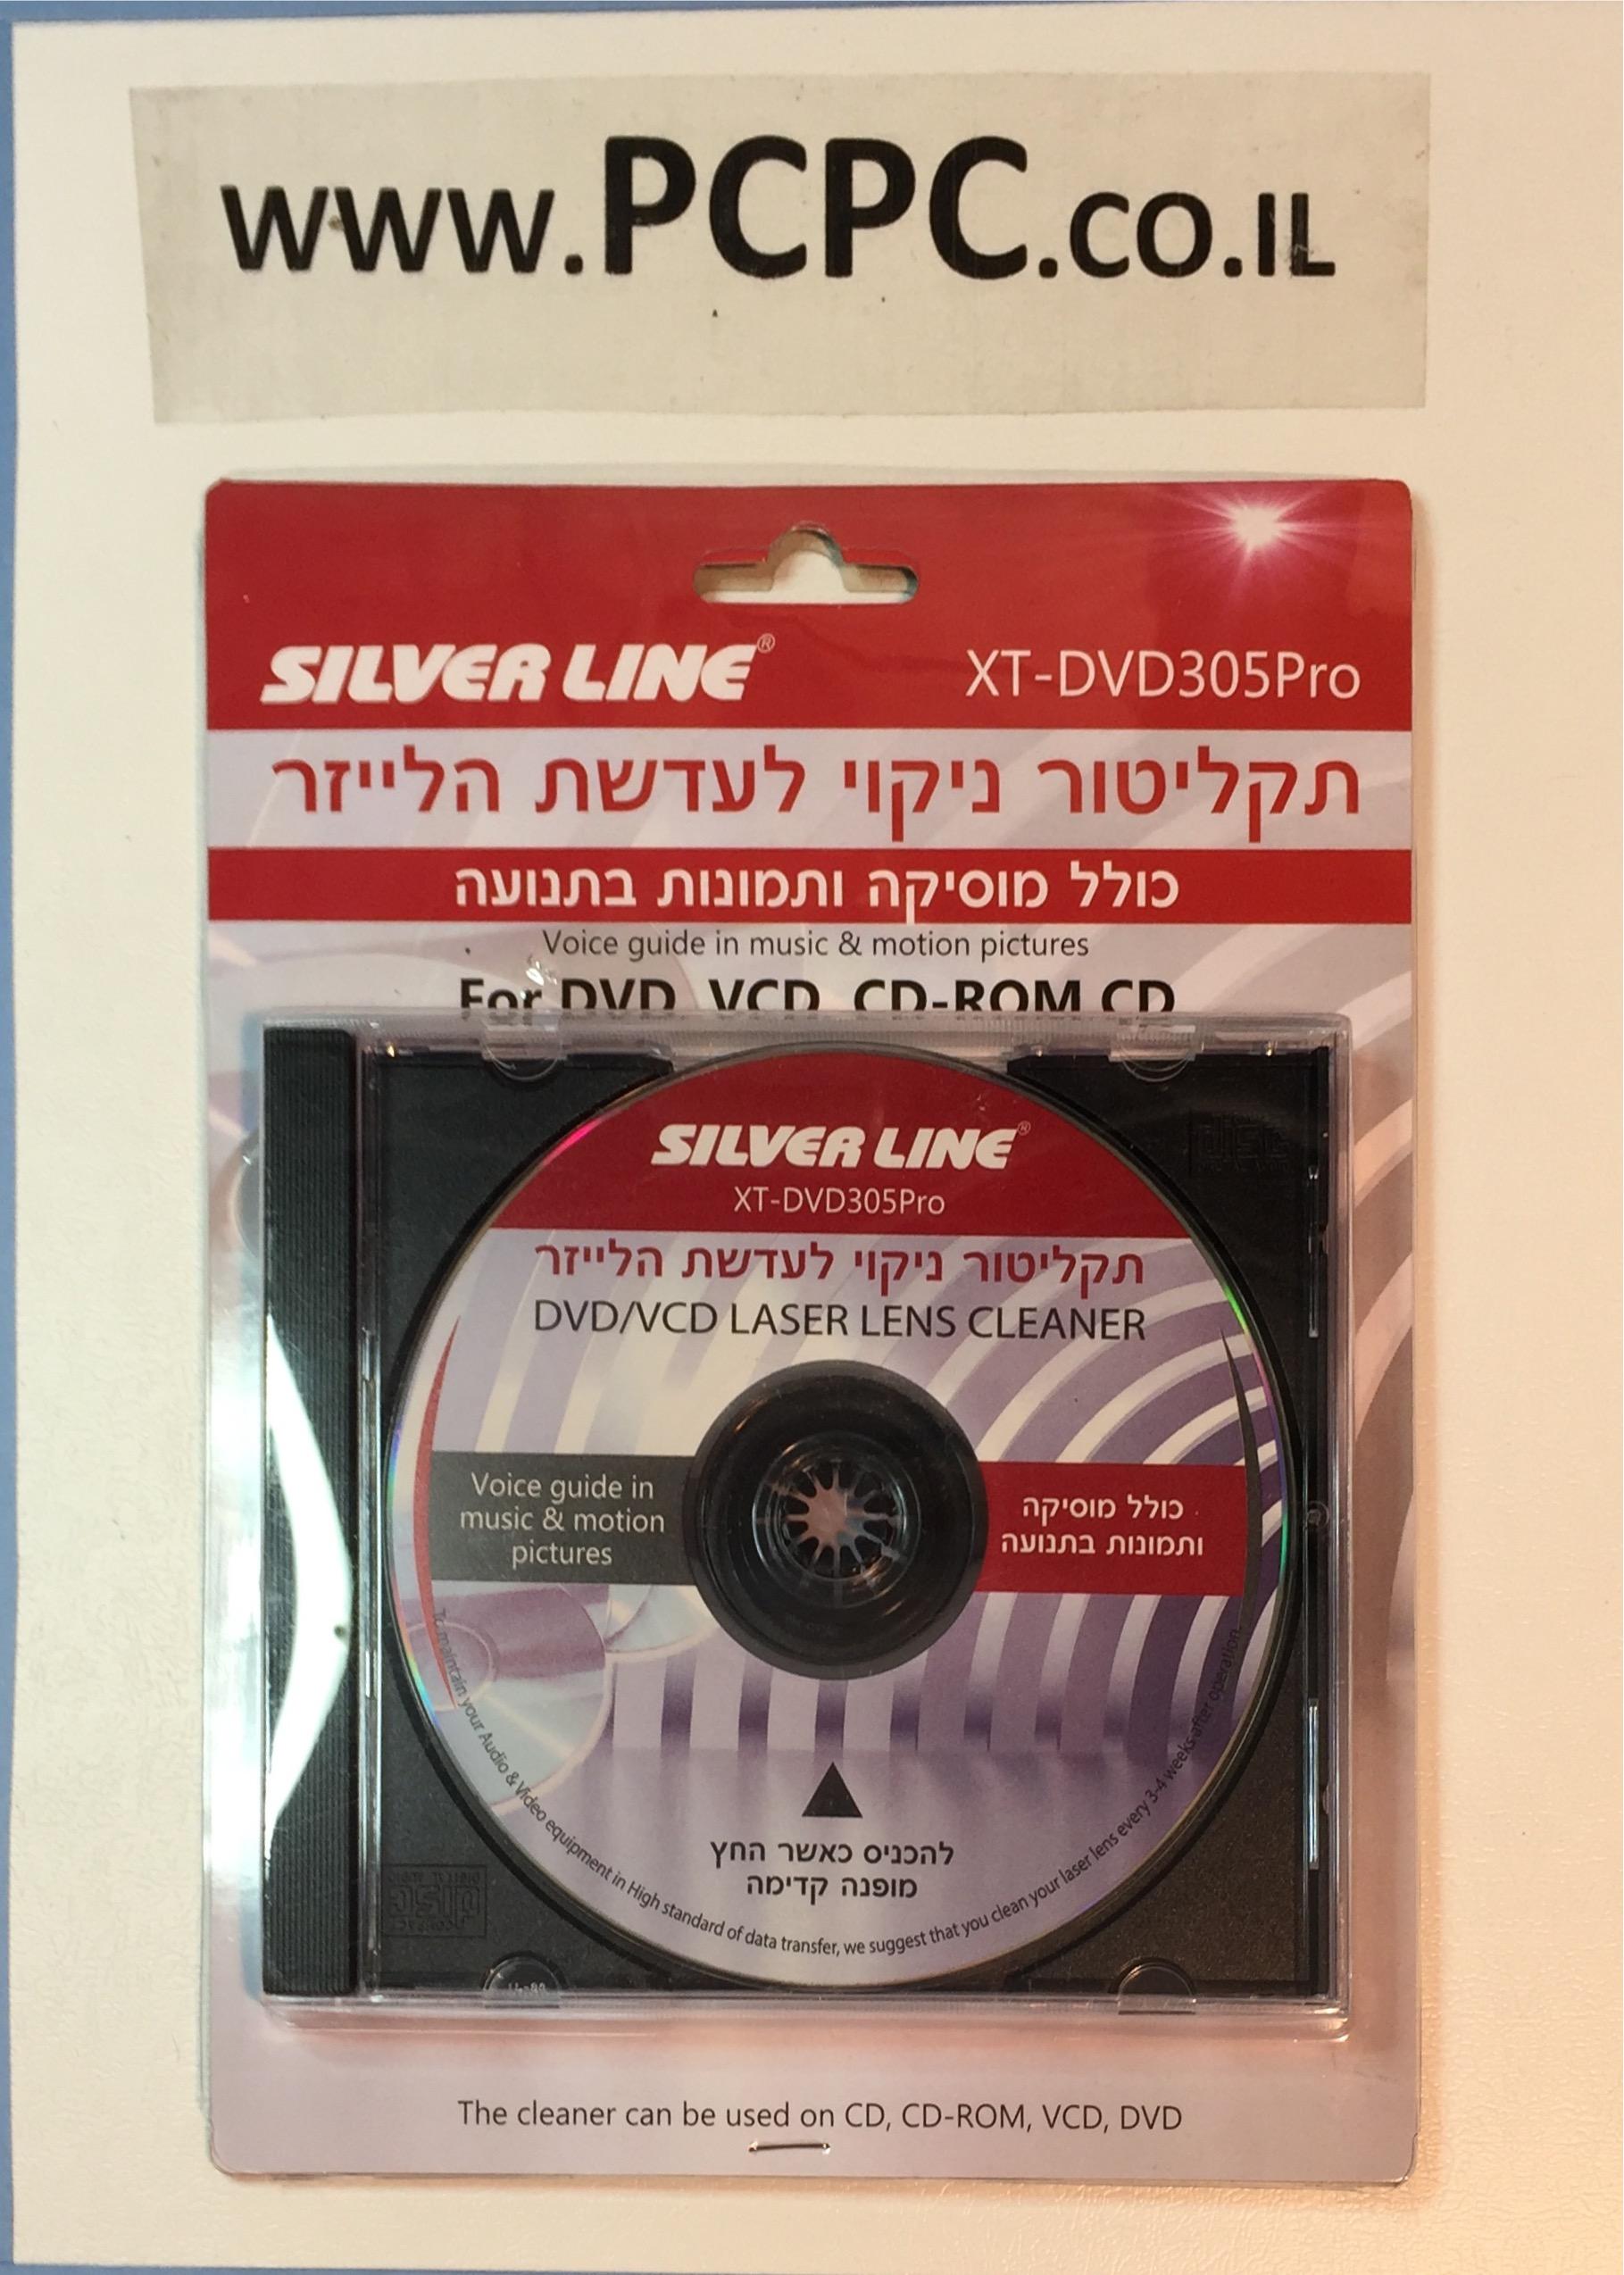 דיסק ניקוי לעדשות ליזר ל CD  DVD